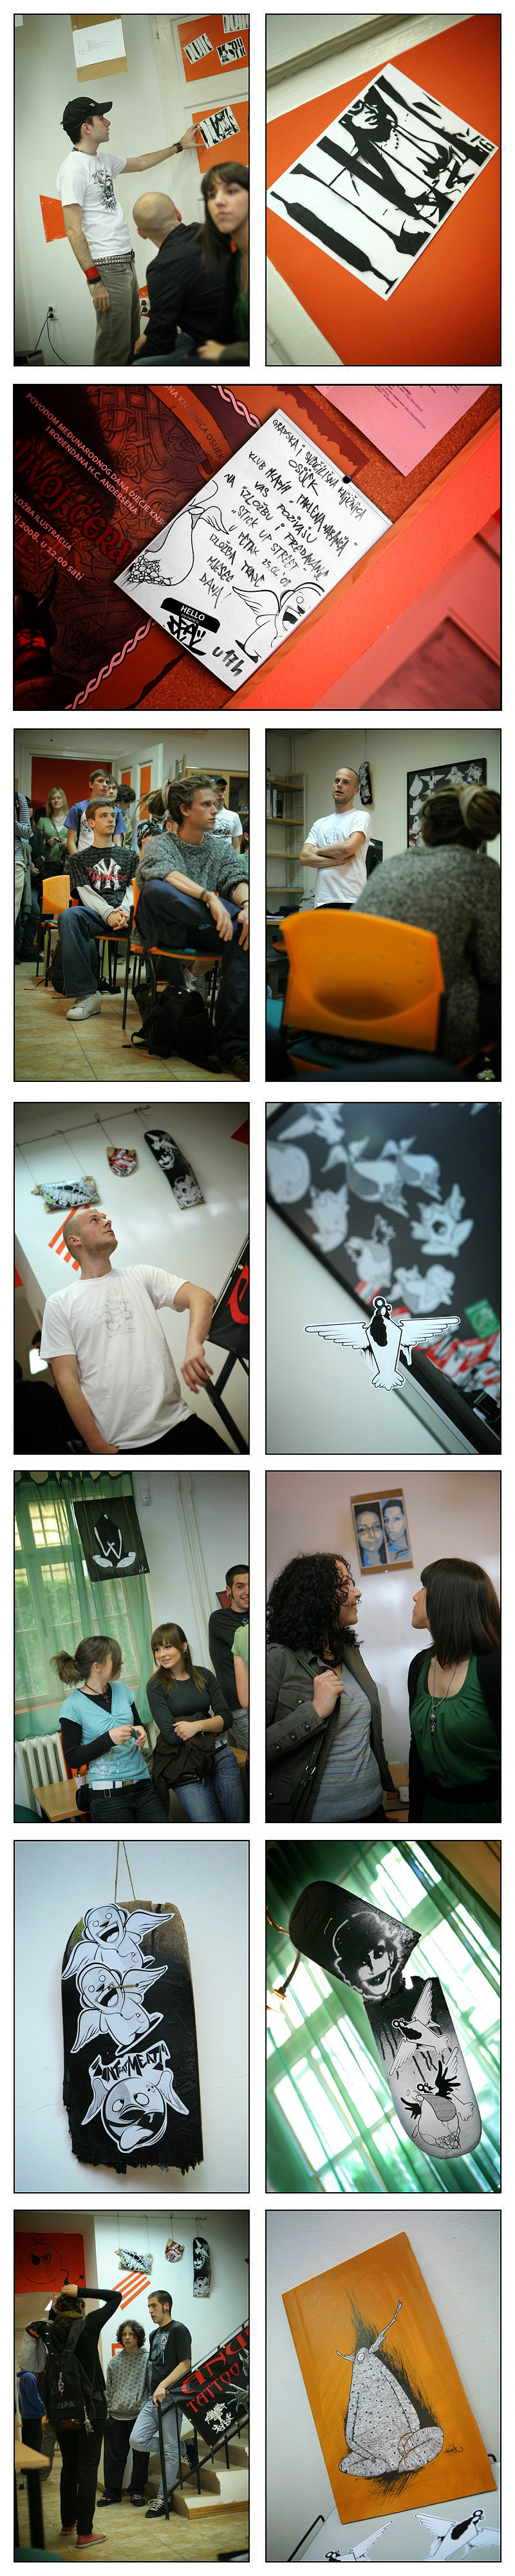 Paklena naranča  [url=http://www.osijek031.com/osijek.php?najava_id=13249]Paklena naranča: street art projekt